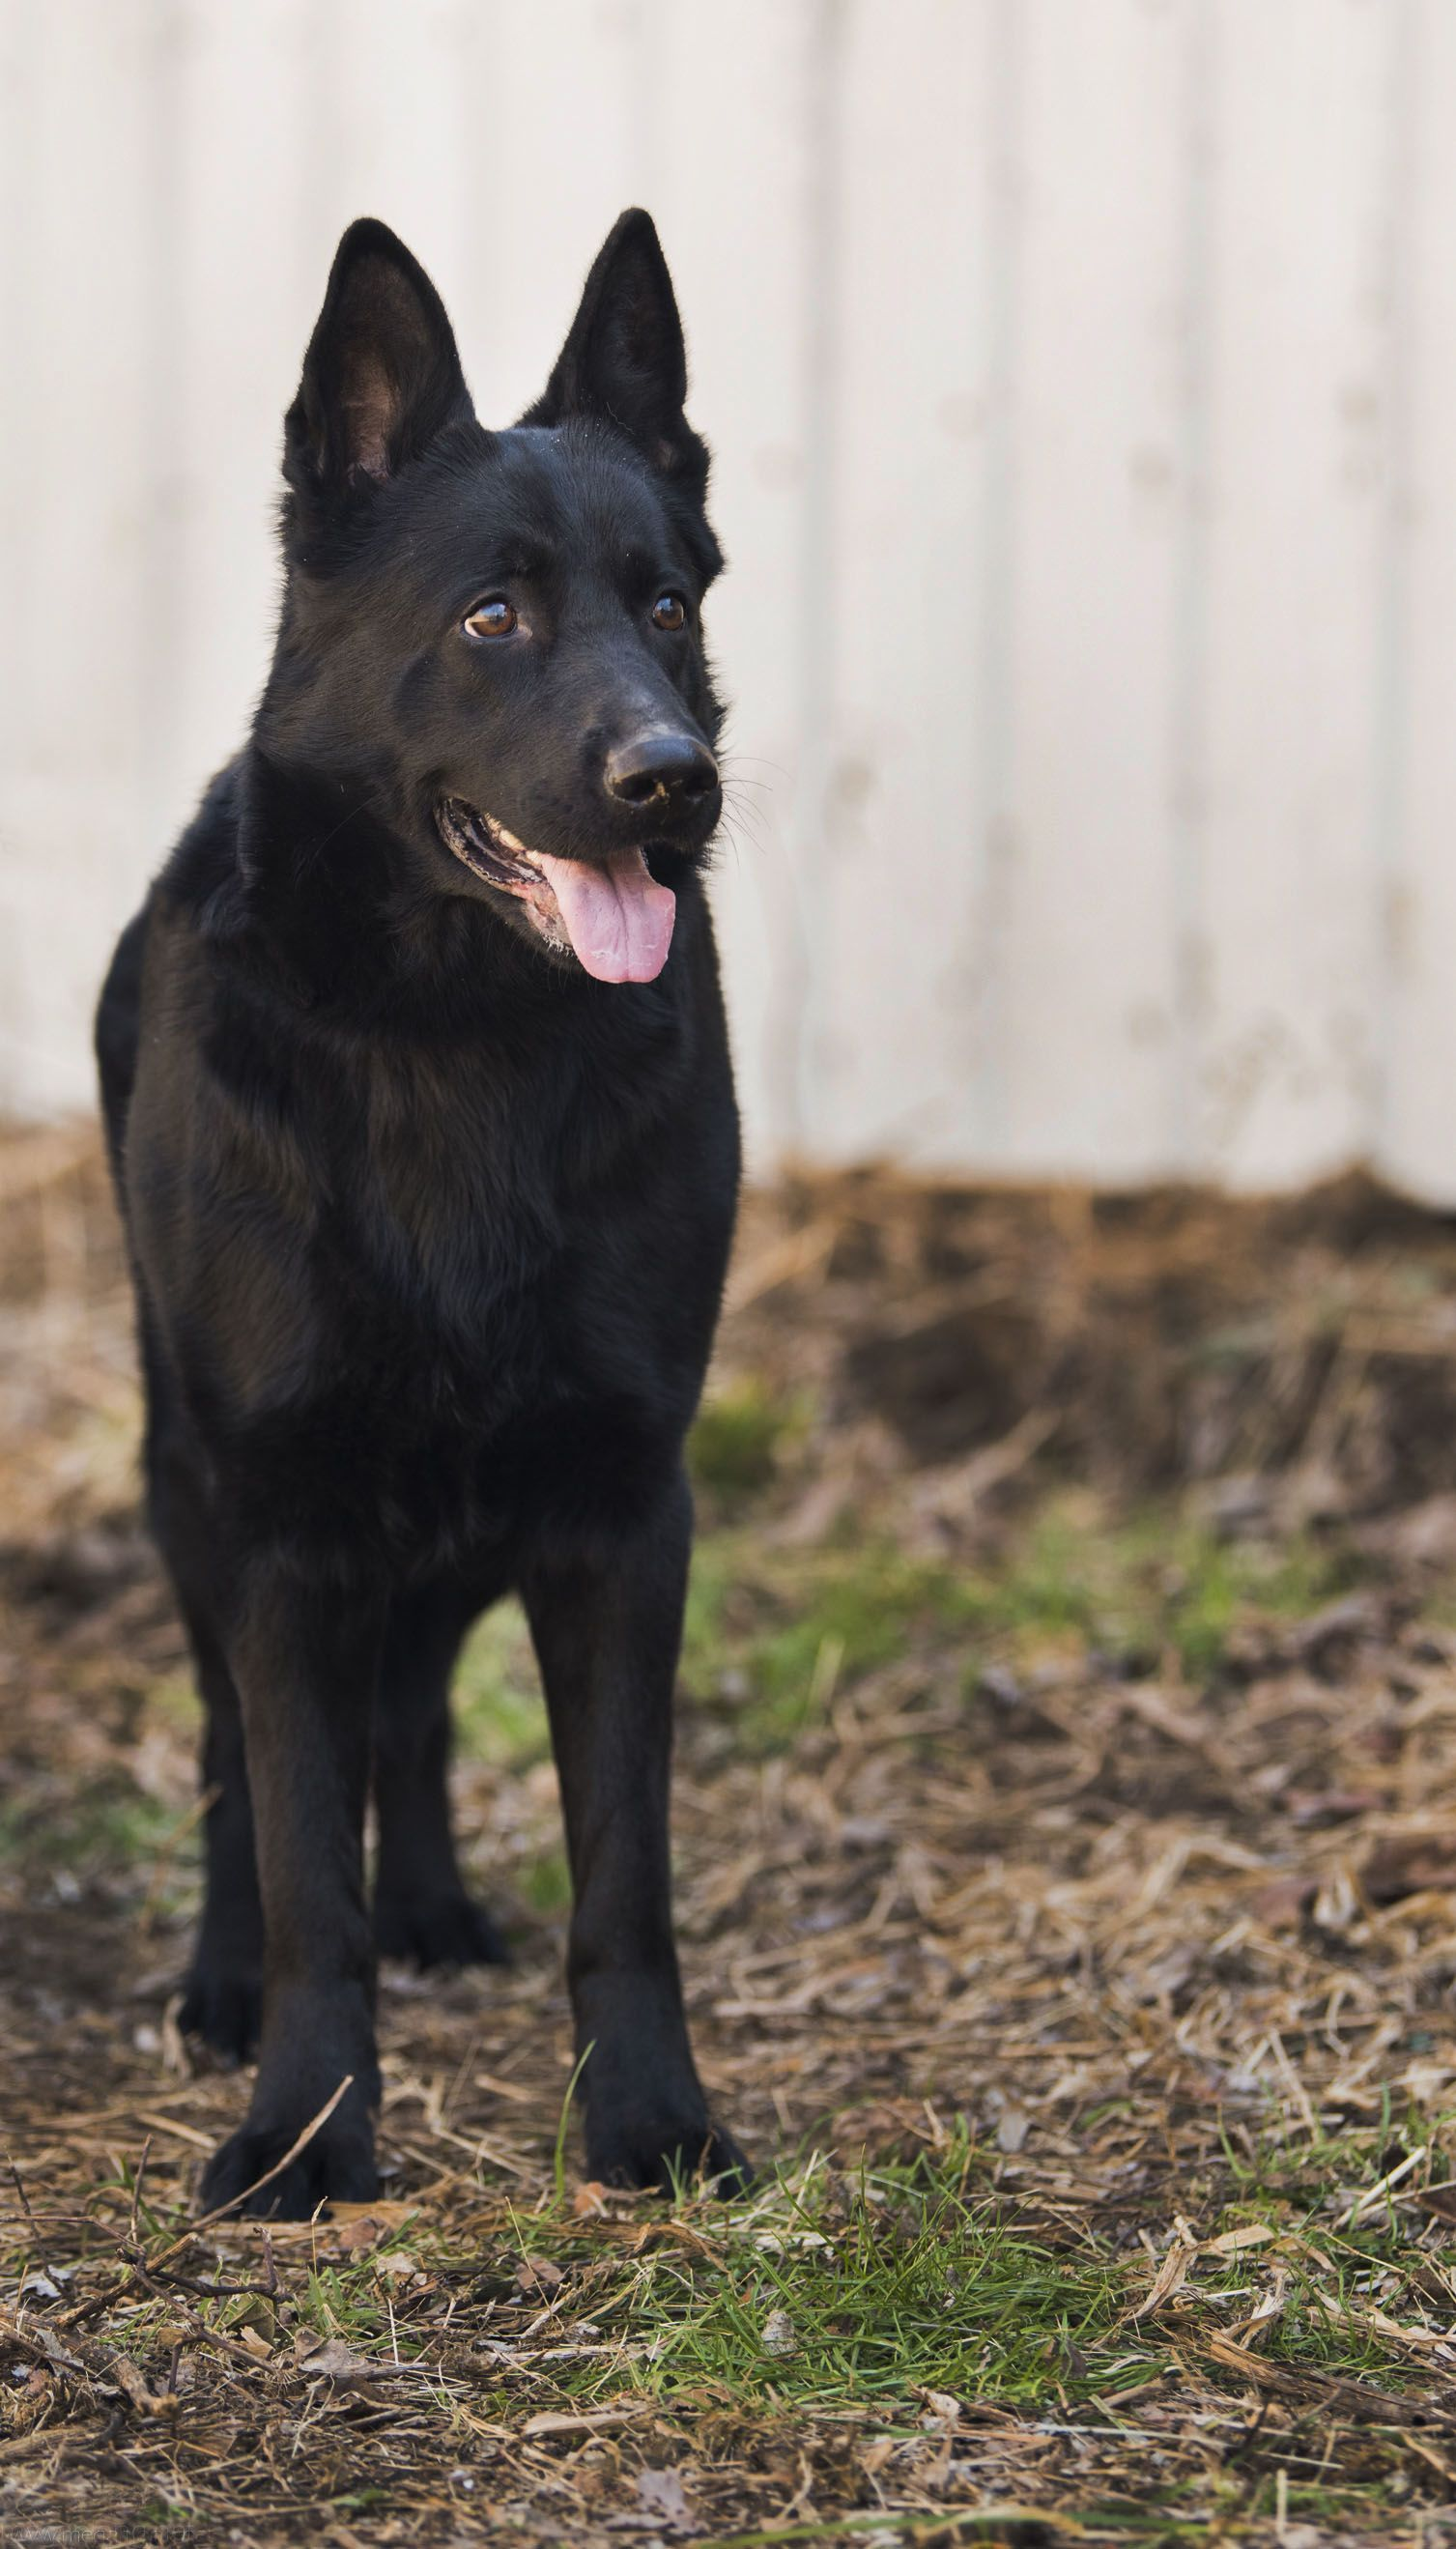 Karma Vom Kleinen Hain Goldenhausk9 Com German Shepherd Dogs Dogs German Shepherd Puppies